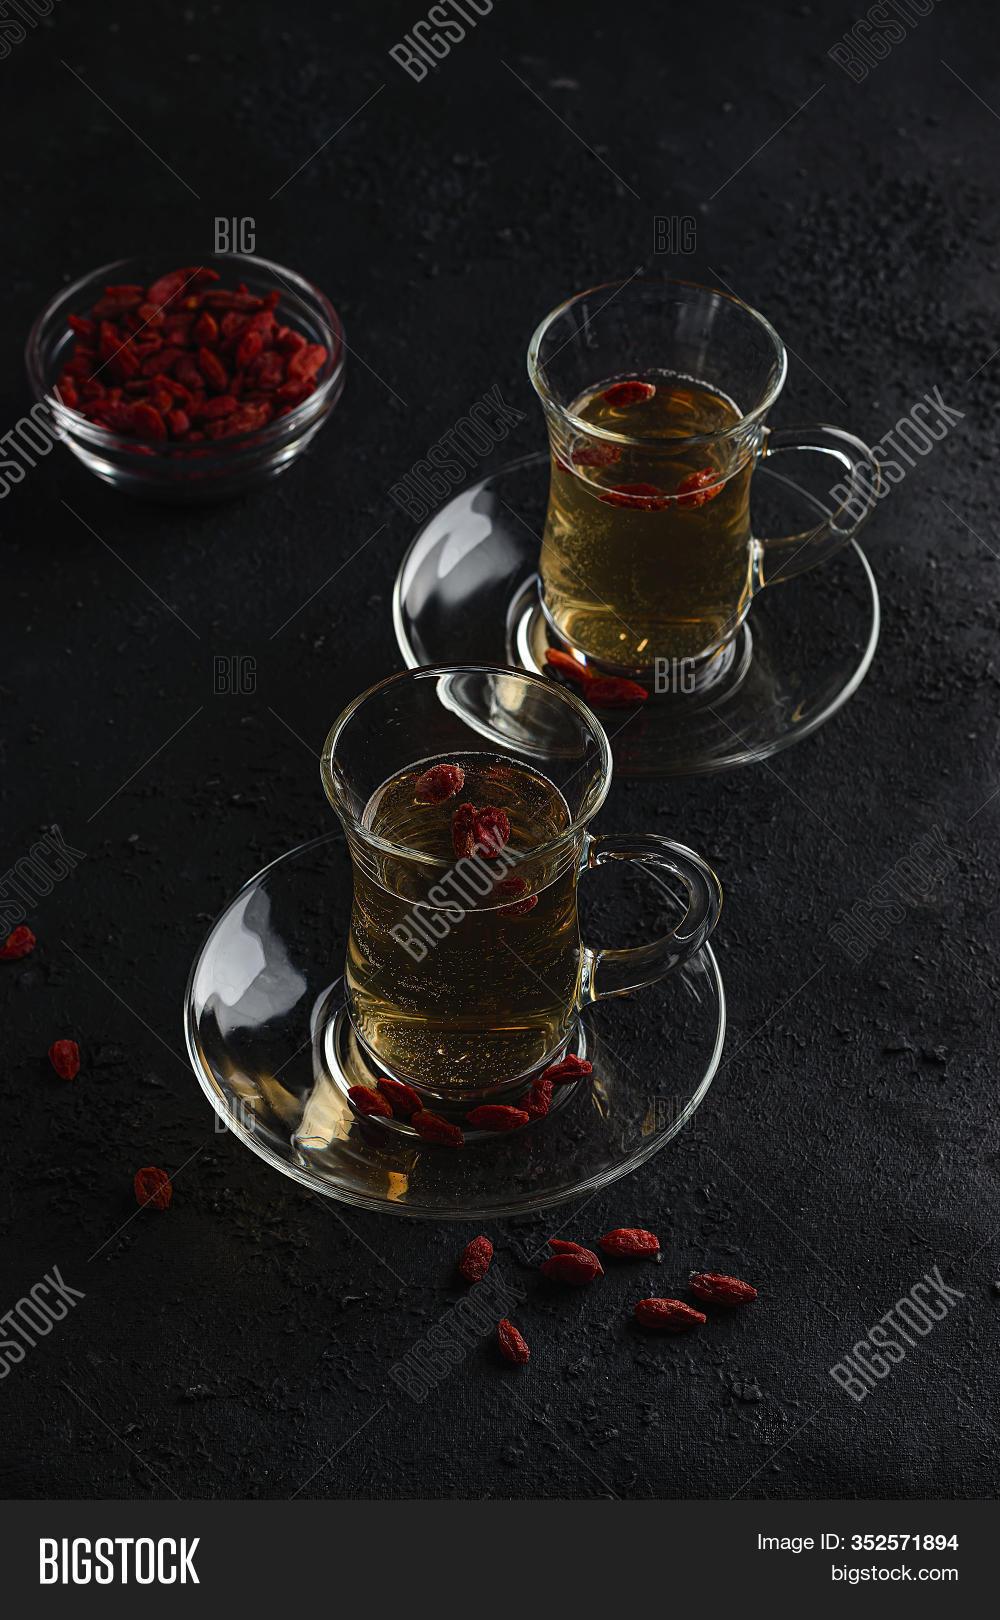 Goji Berry Tea Image Photo Free Trial Bigstock